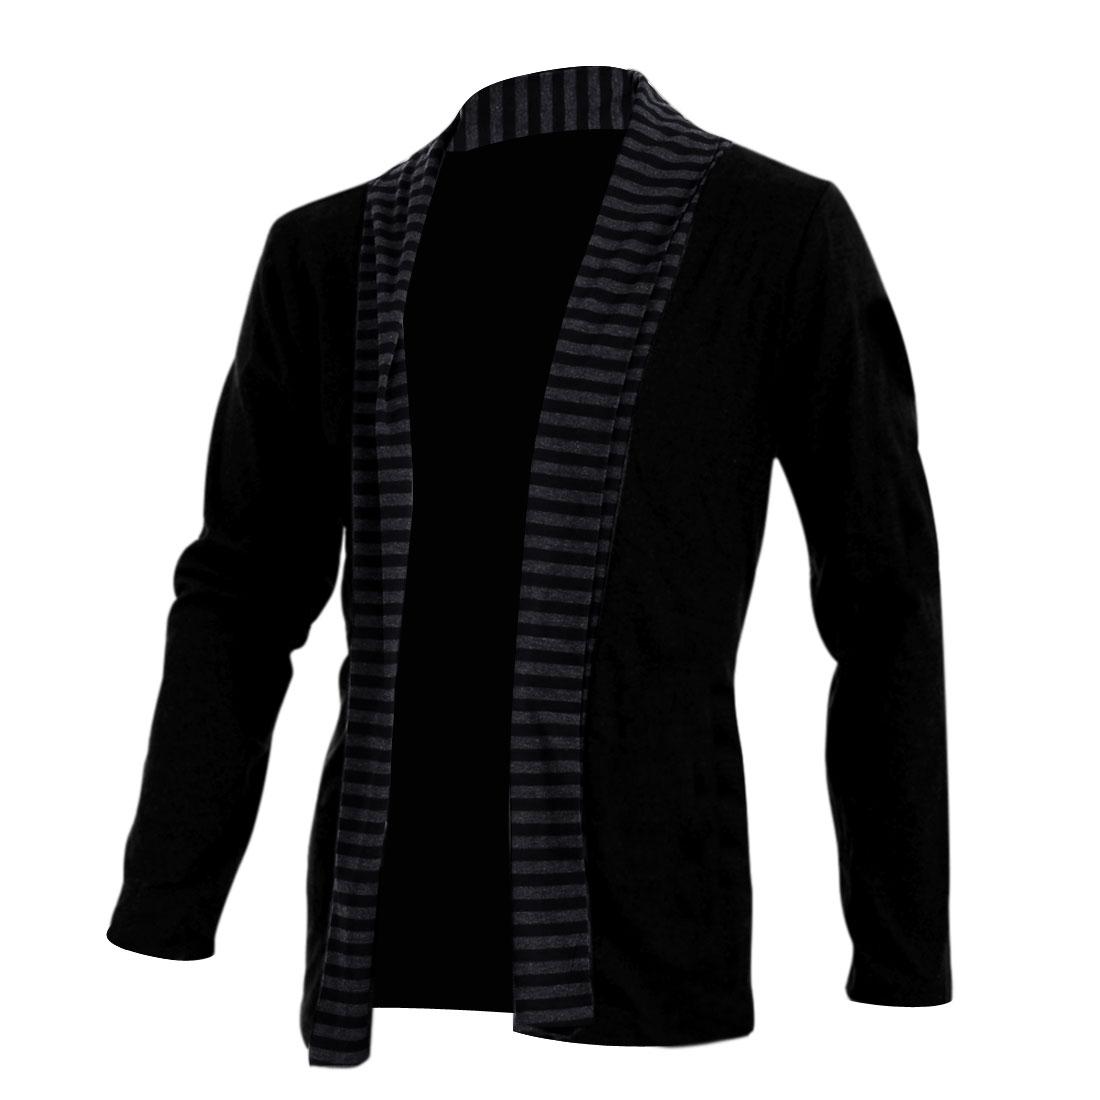 Mens Black Long Sleeves Panel Stylish Casual Light Coat M